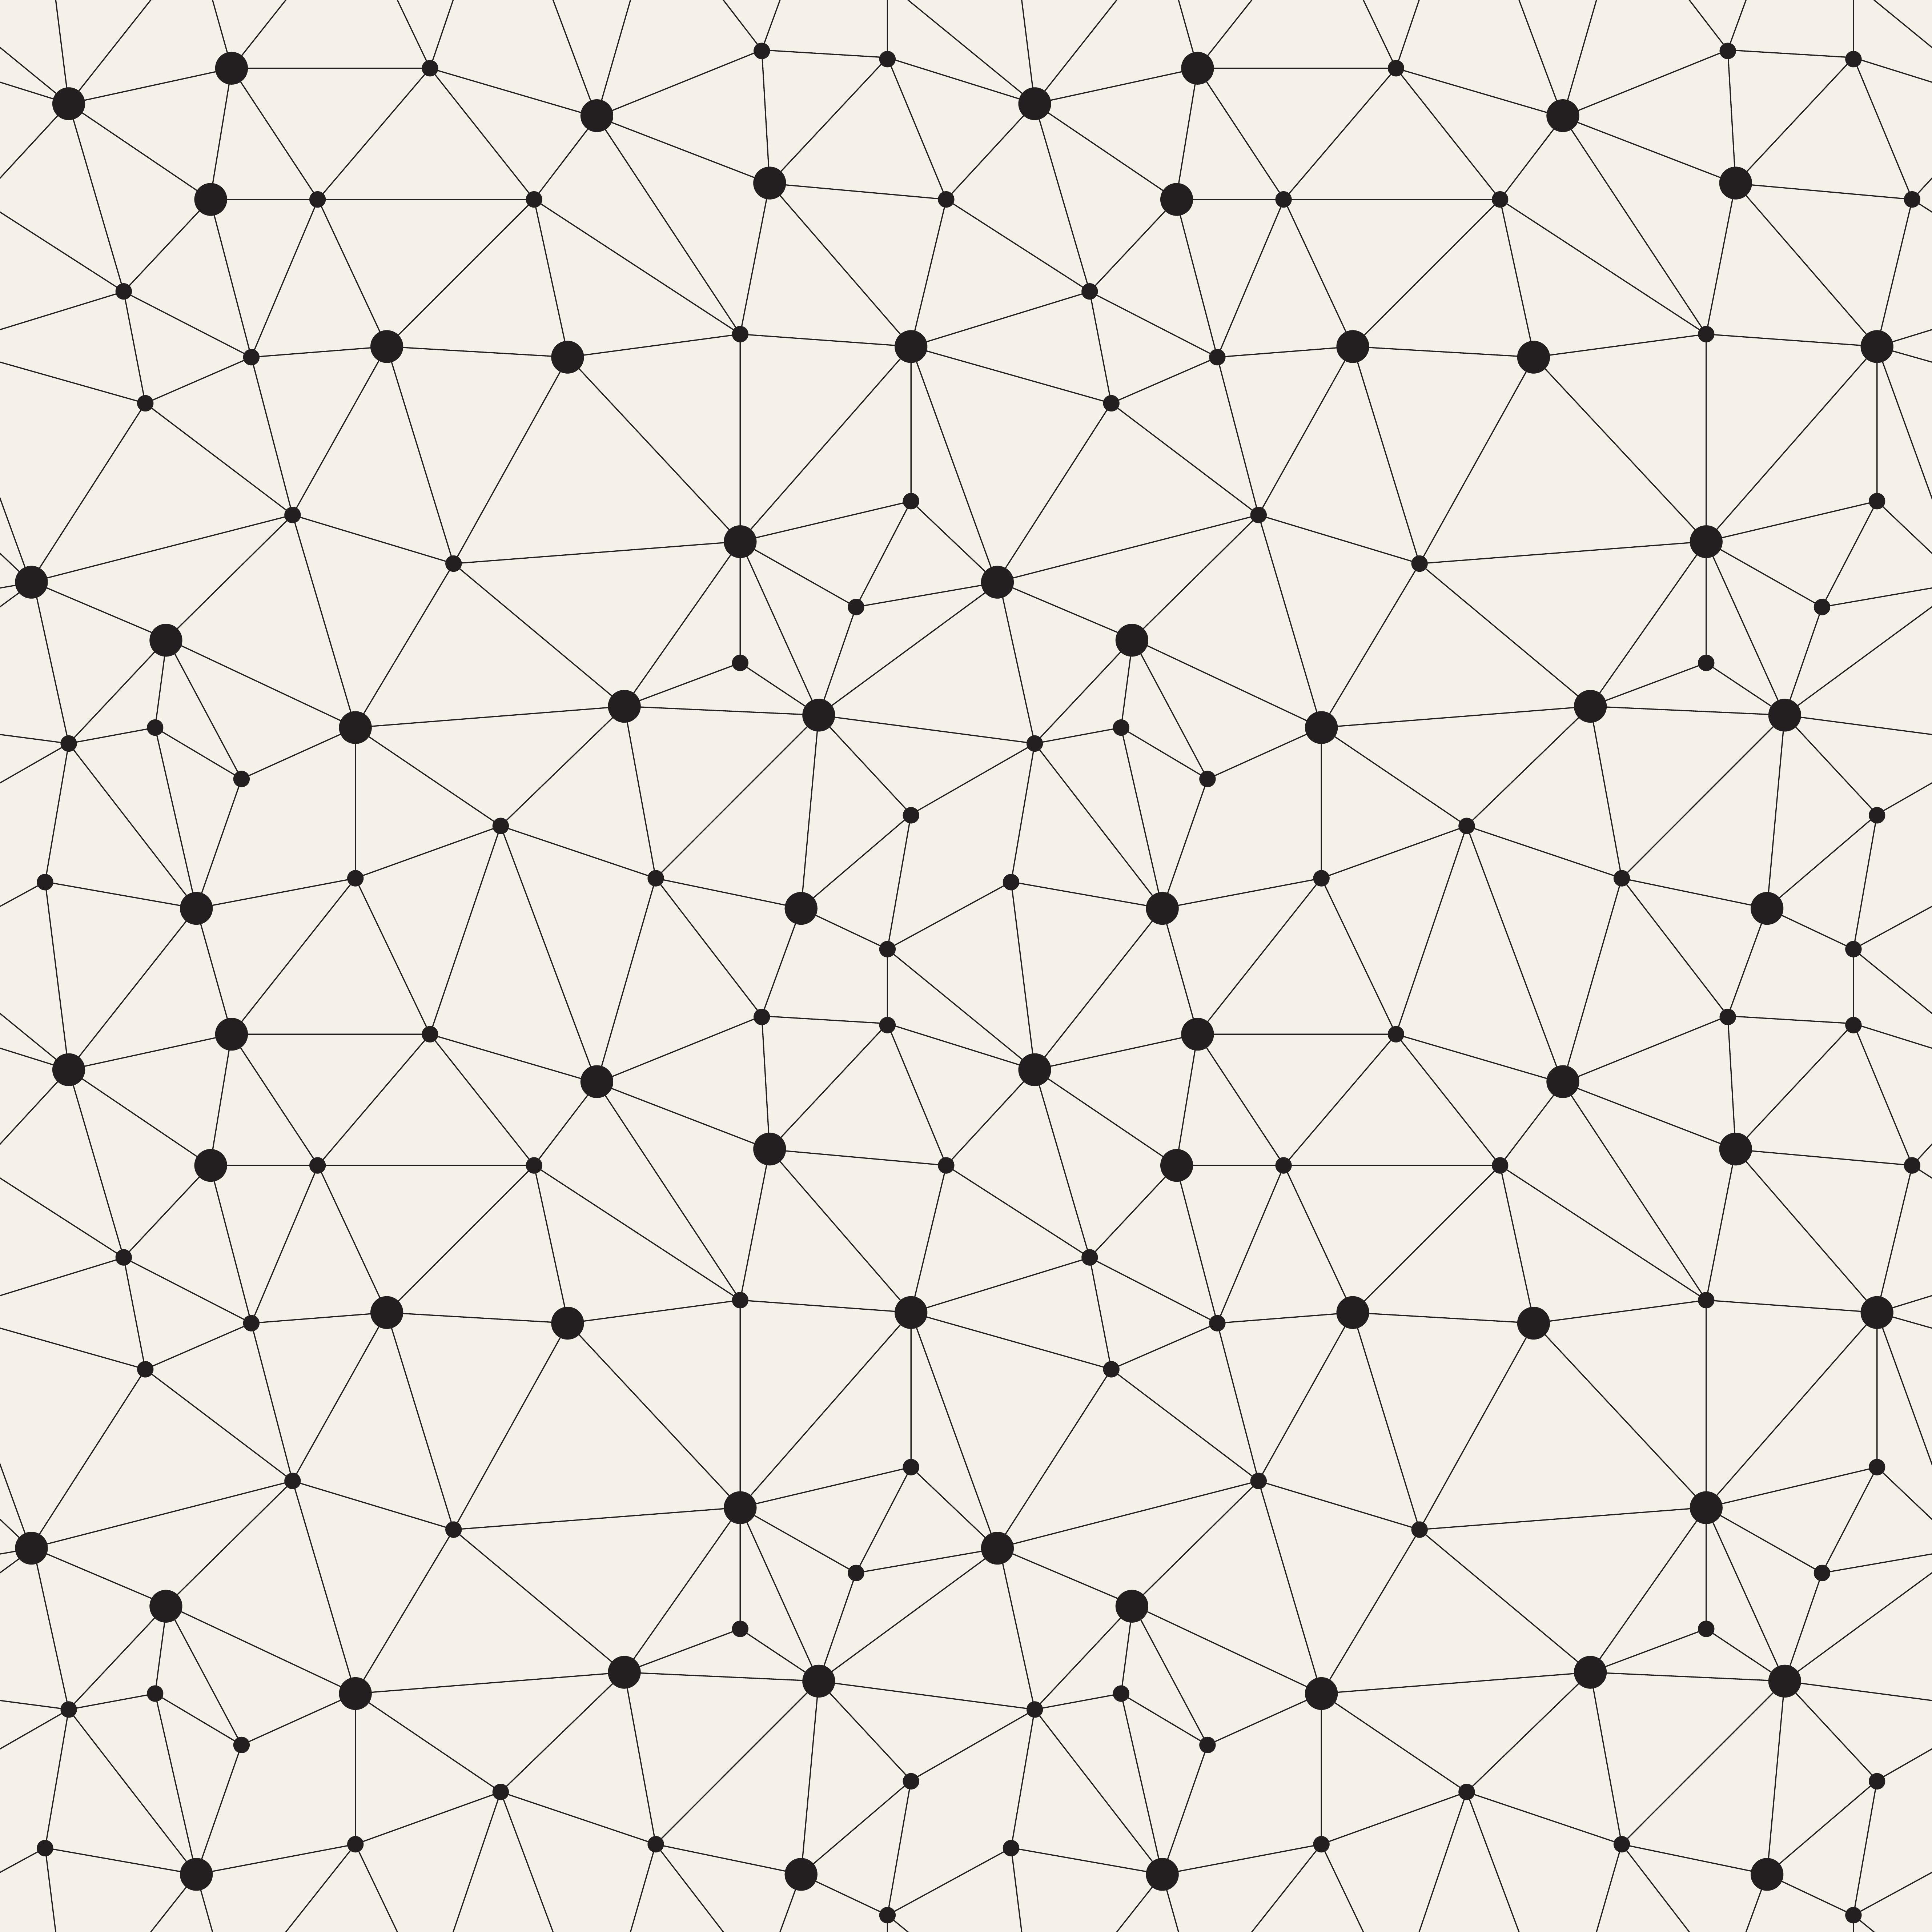 Top 25 Non-Financial Blockchain Startups